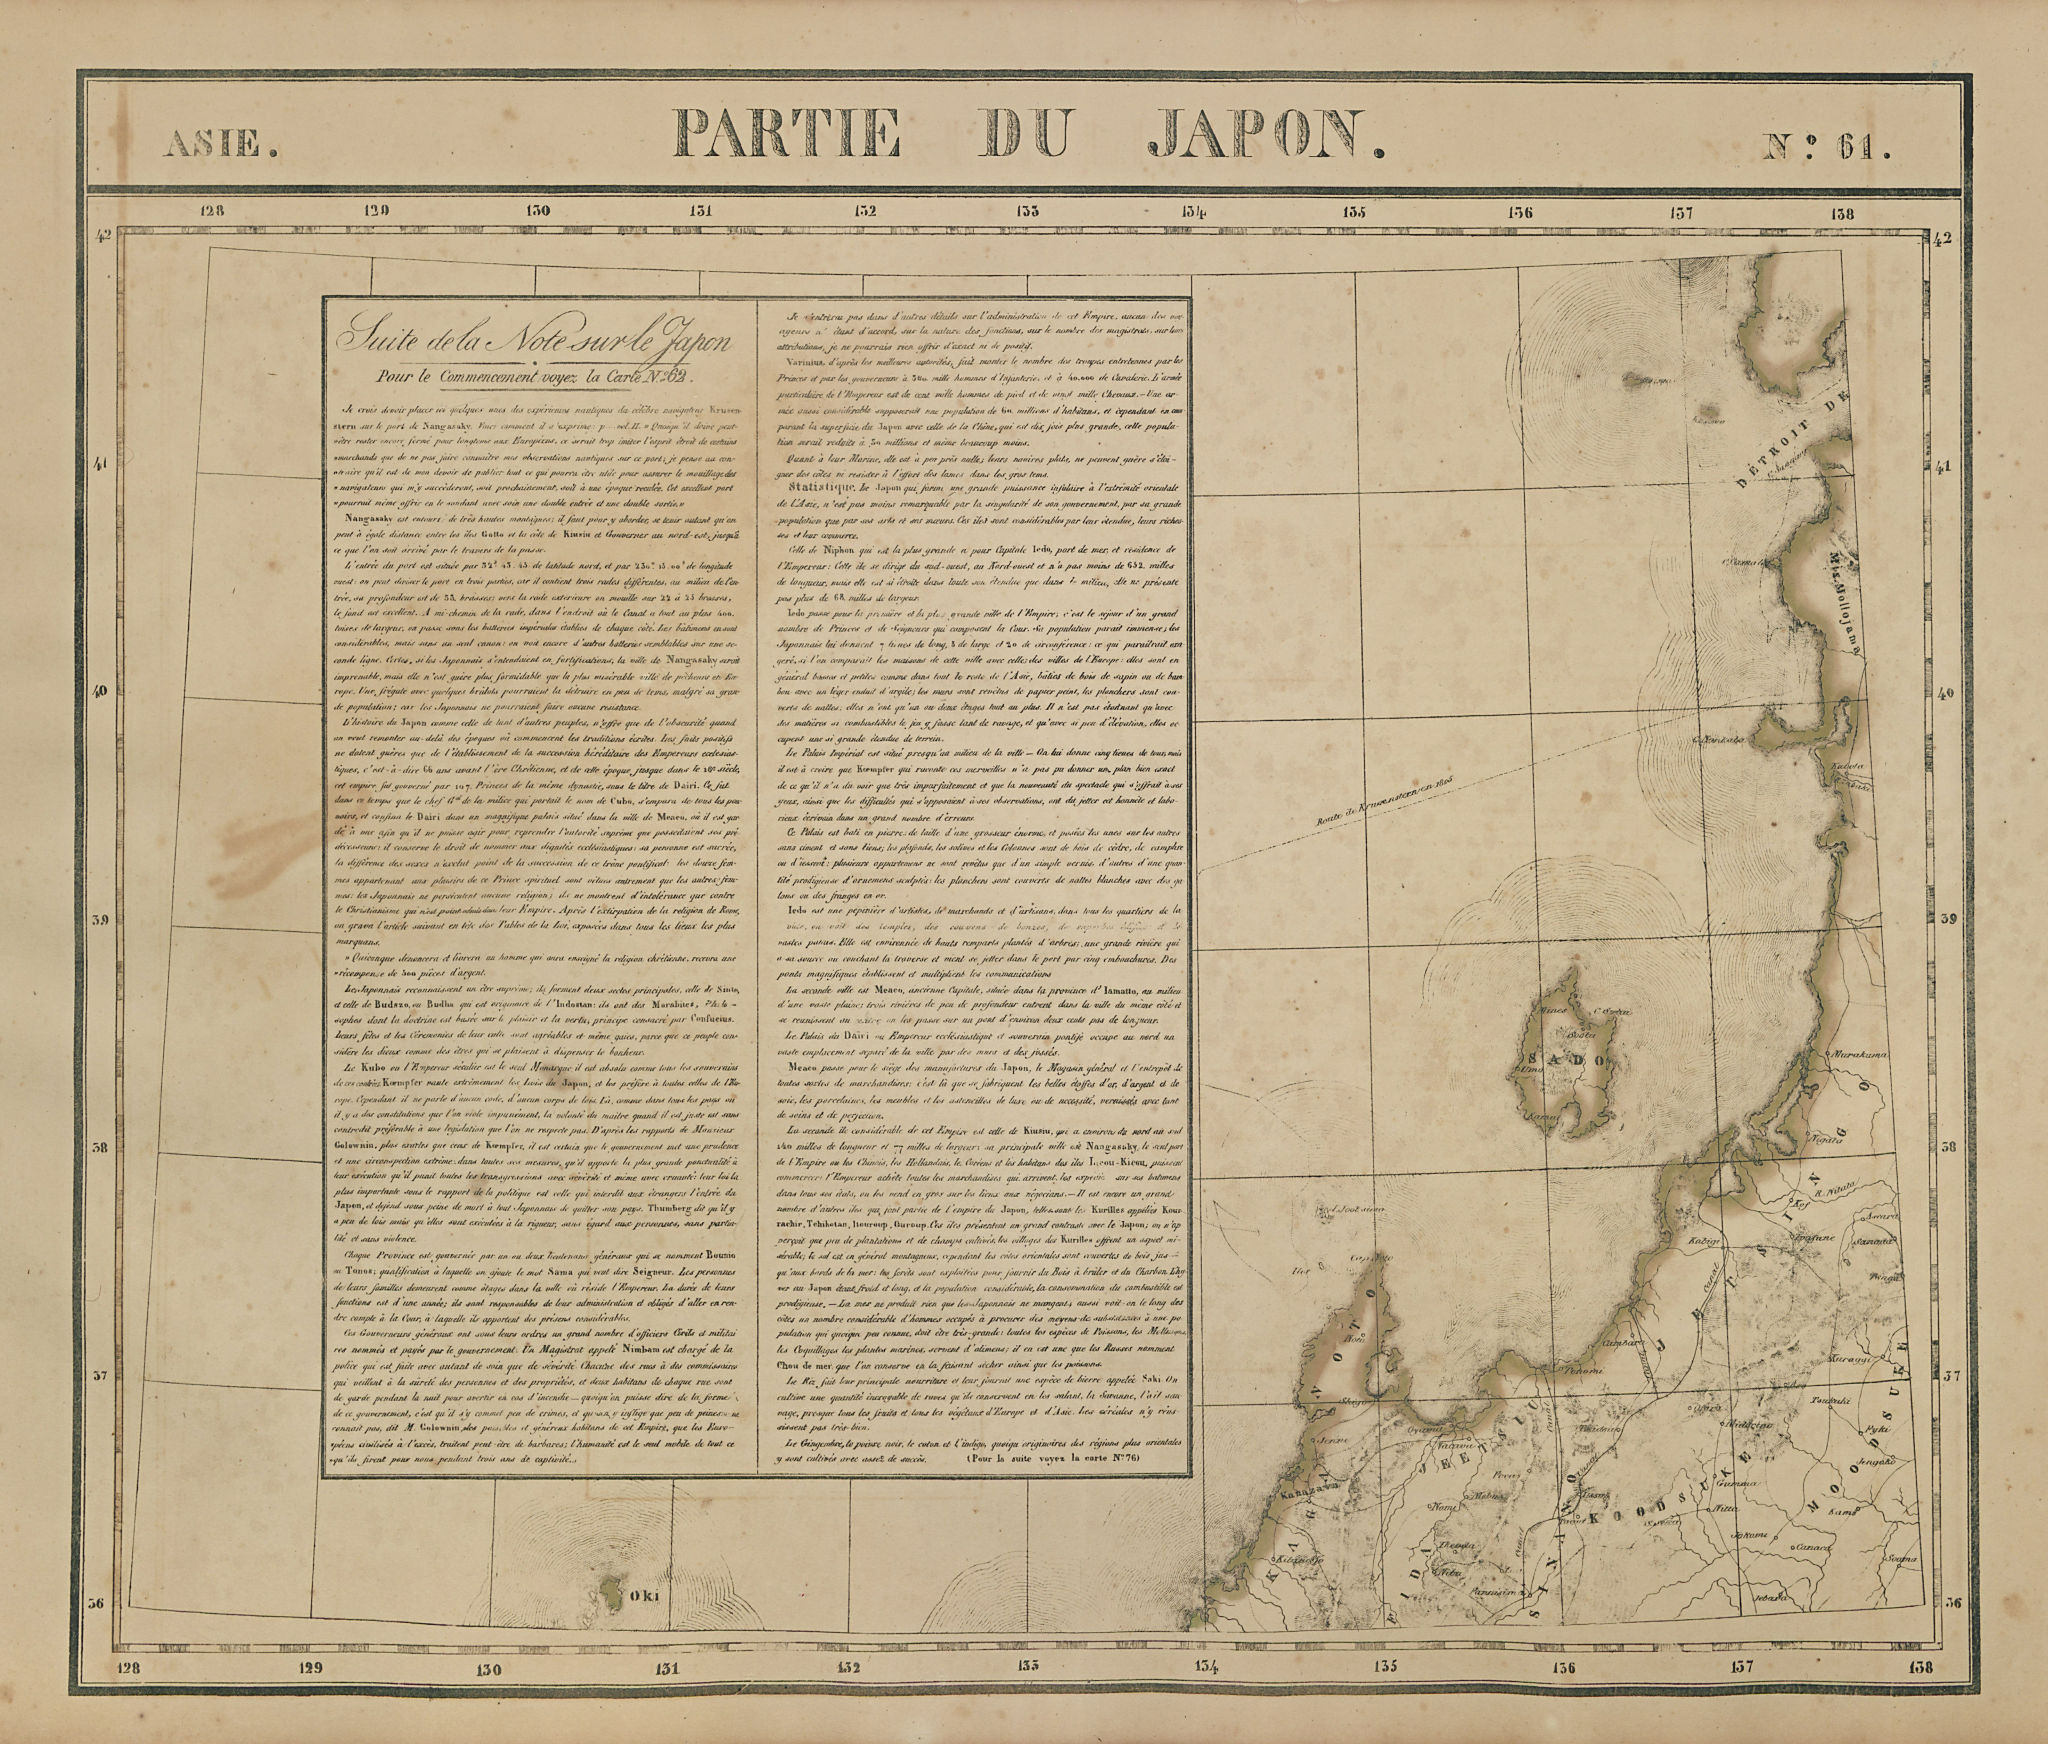 Asie. Partie du Japon #61 Japan. West-central Honshu coast VANDERMAELEN 1827 map